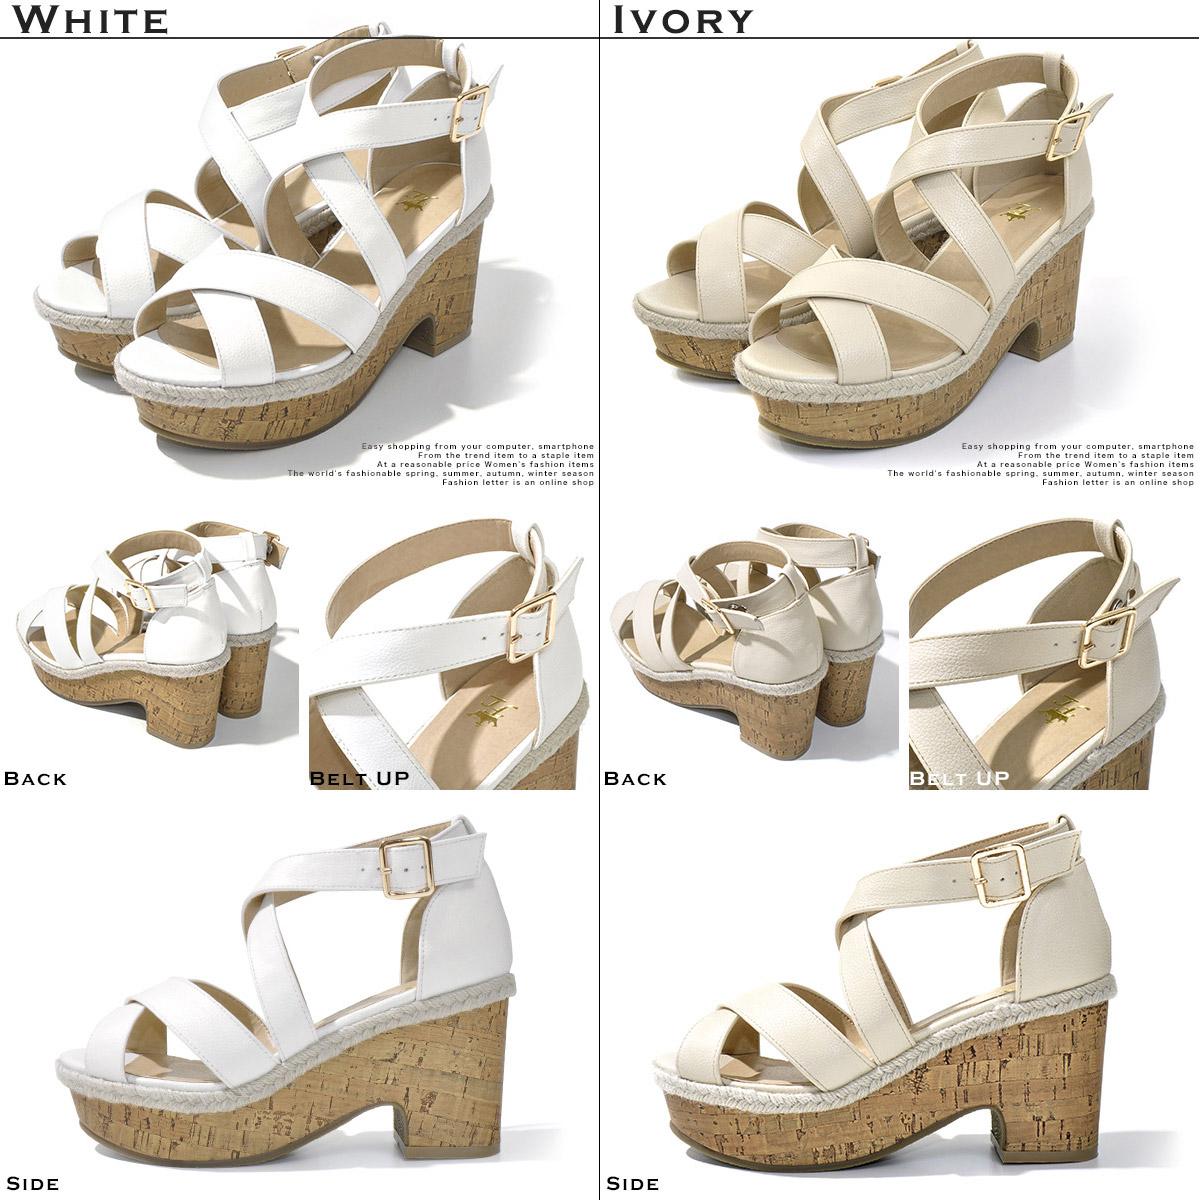 Sandals shoes summer - Gladiator Sandals Shoes Cross Berthyheelwedgsawl Sandals Wedge Heel Thick Heel Casual Jute Sandals Legs 9